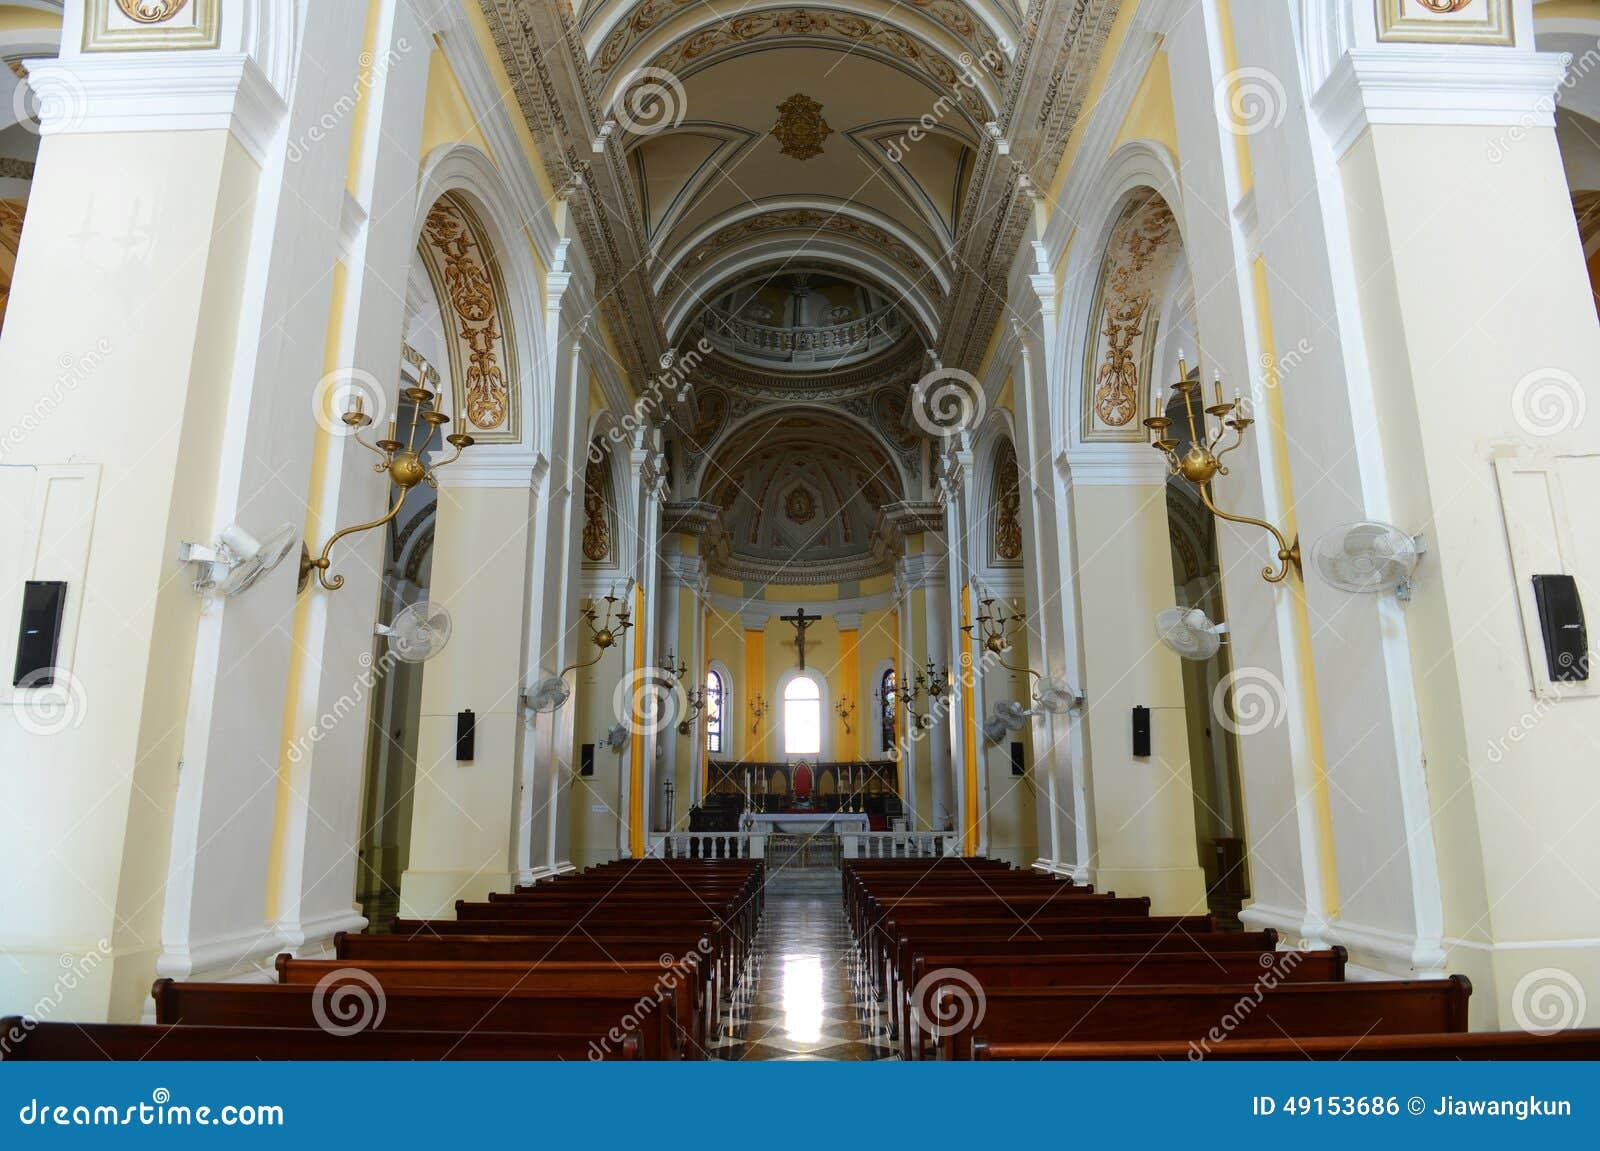 san juan catholic singles San juan singles ministries, san juan, trinidad and tobago 38 likes san juan singles ministry- mantle of the overcomers is geared towards ministering.